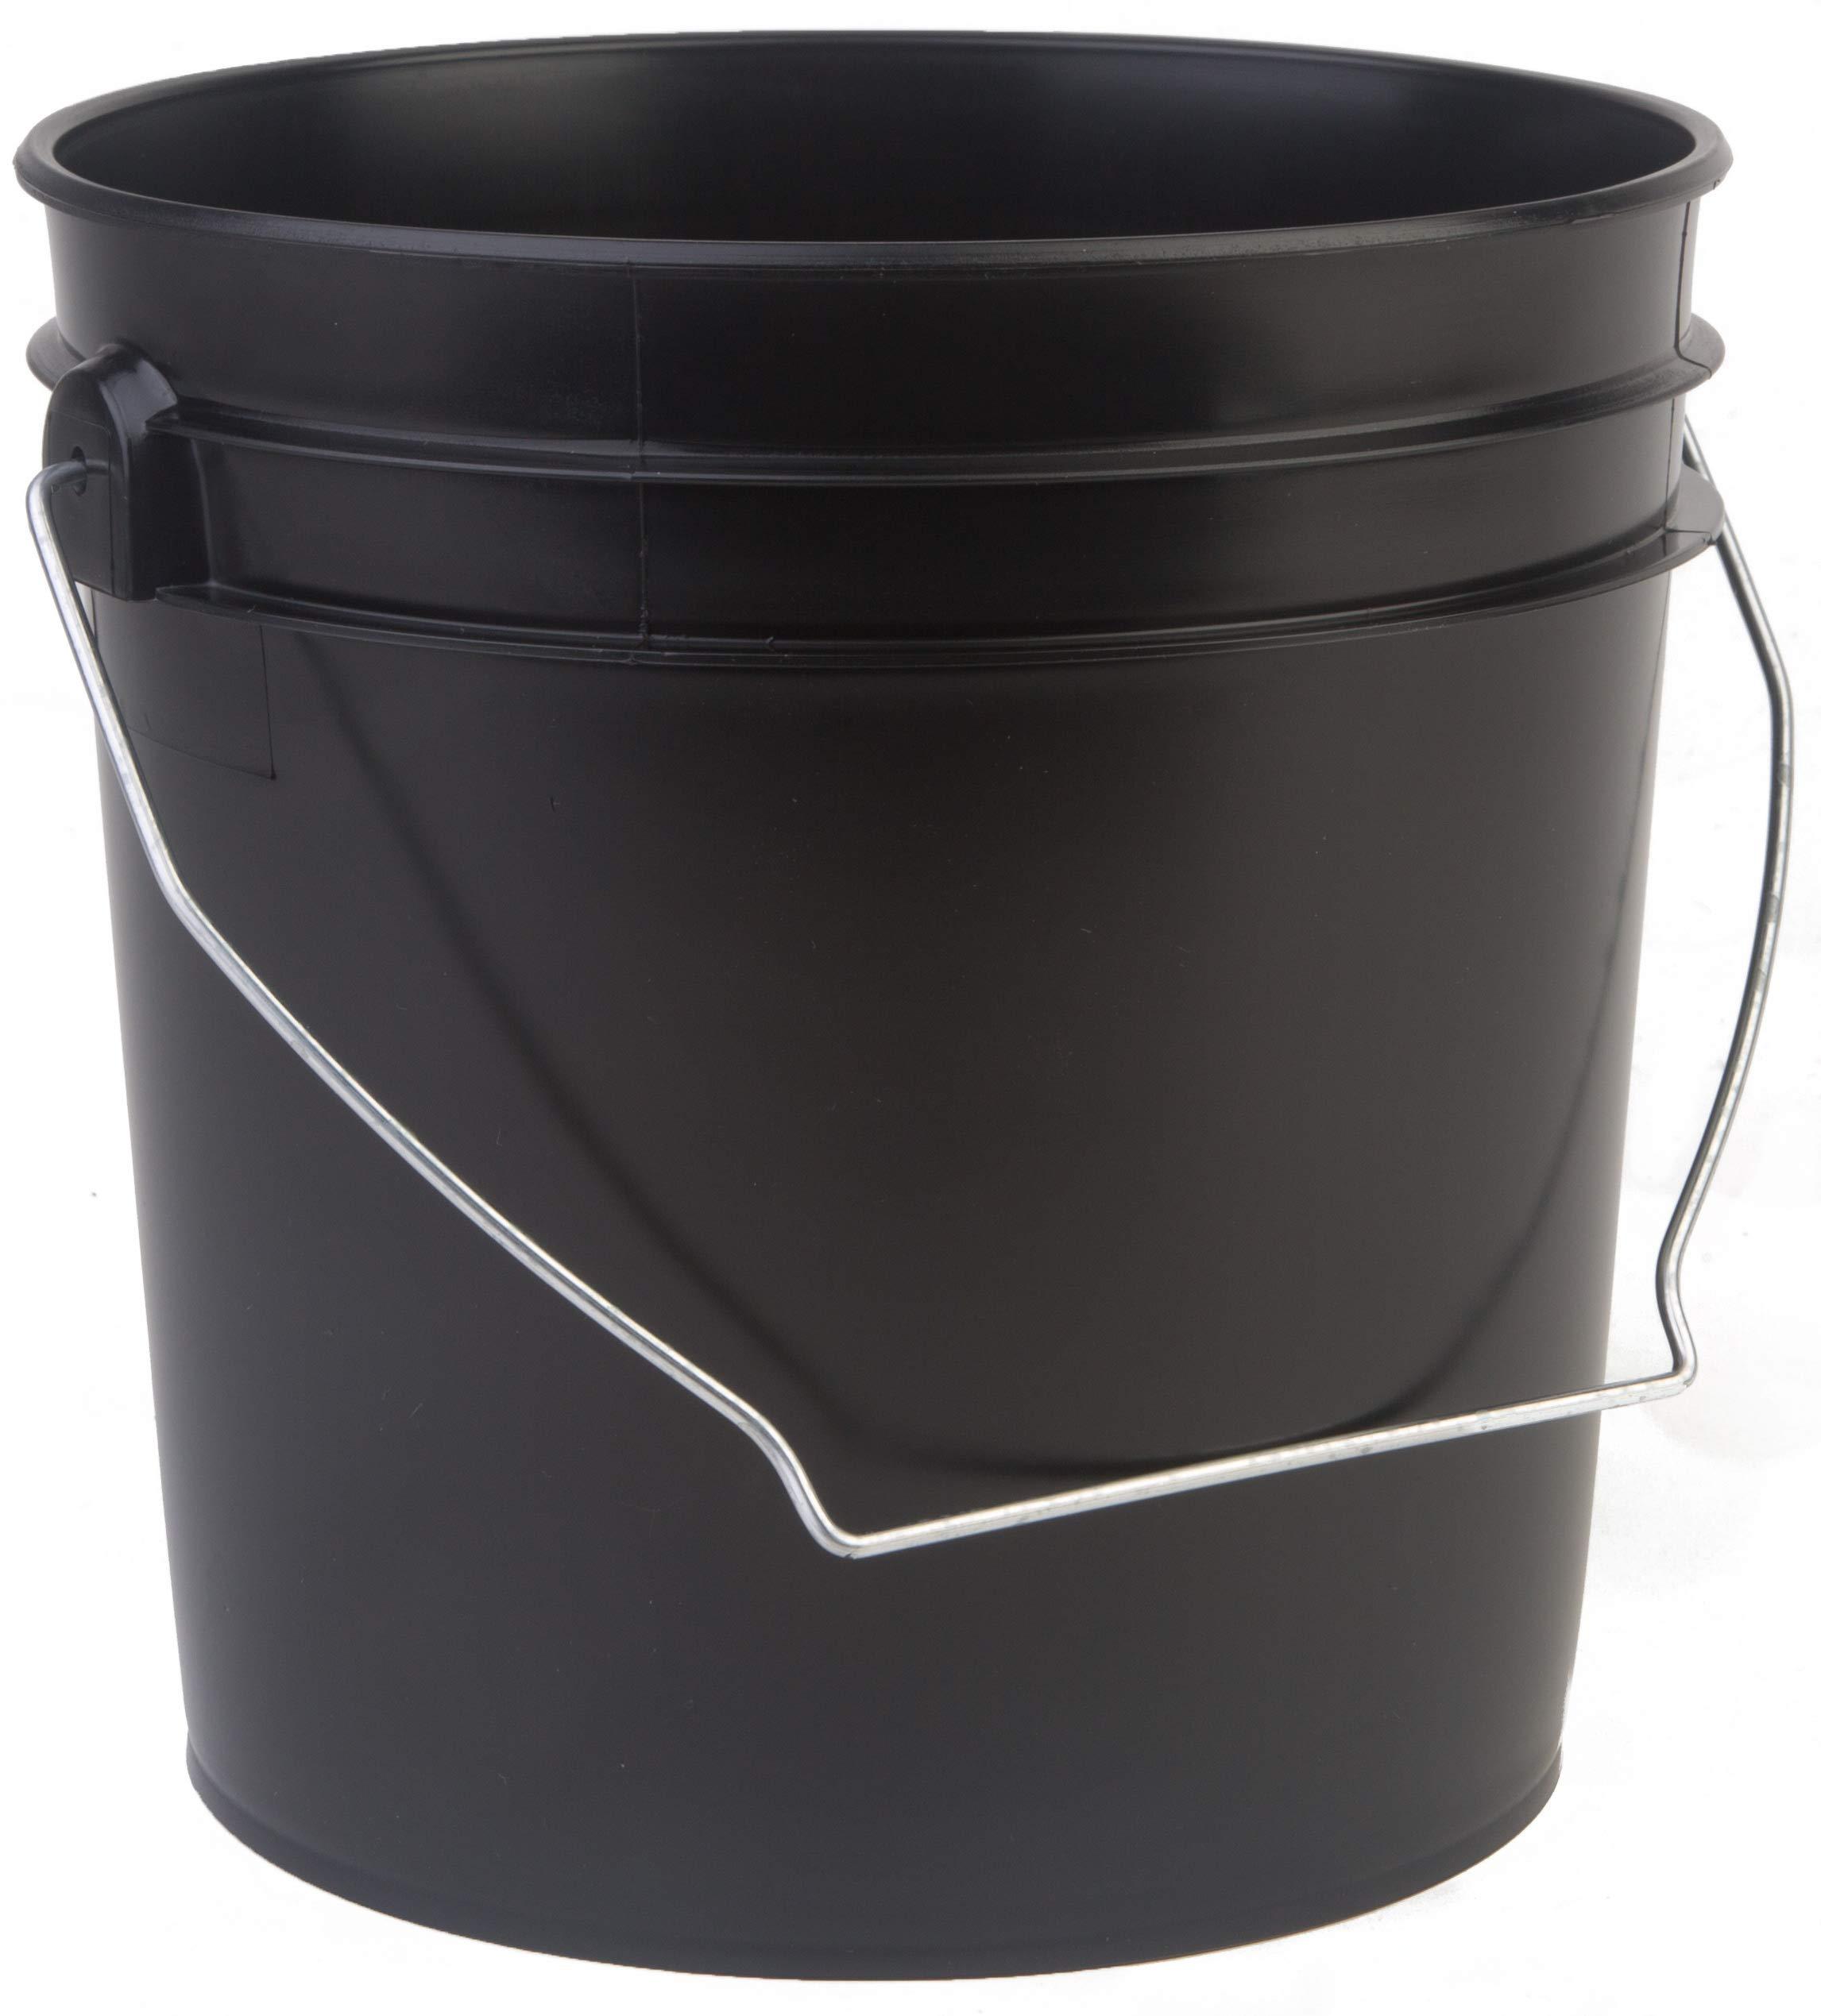 Hudson Exchange Premium 1 Gallon Bucket, HDPE, Black, 6 Pack